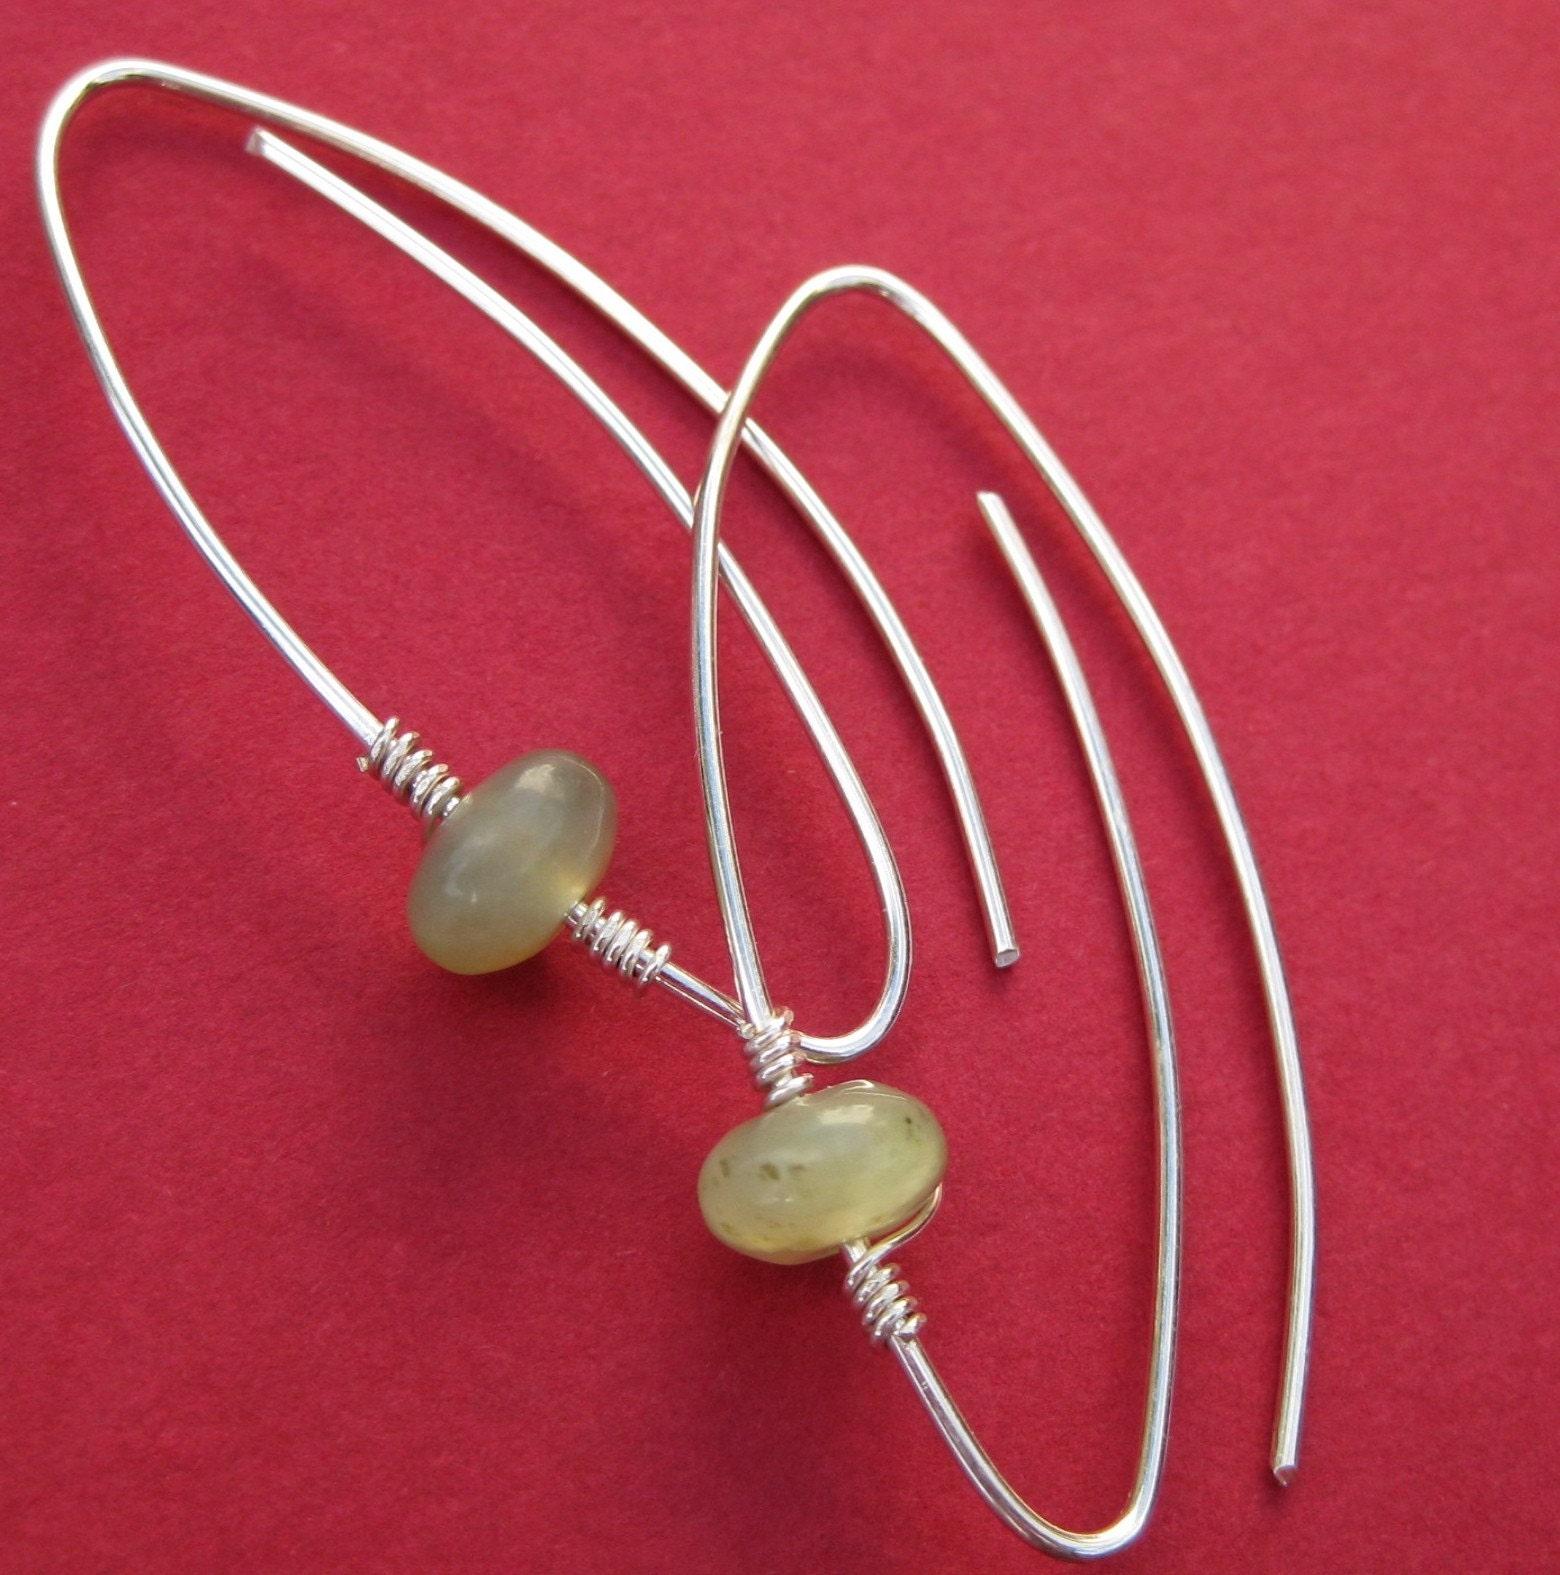 Silhouette Earrings: Jade And Silver Spiral Leaf Silhouette Earrings Free